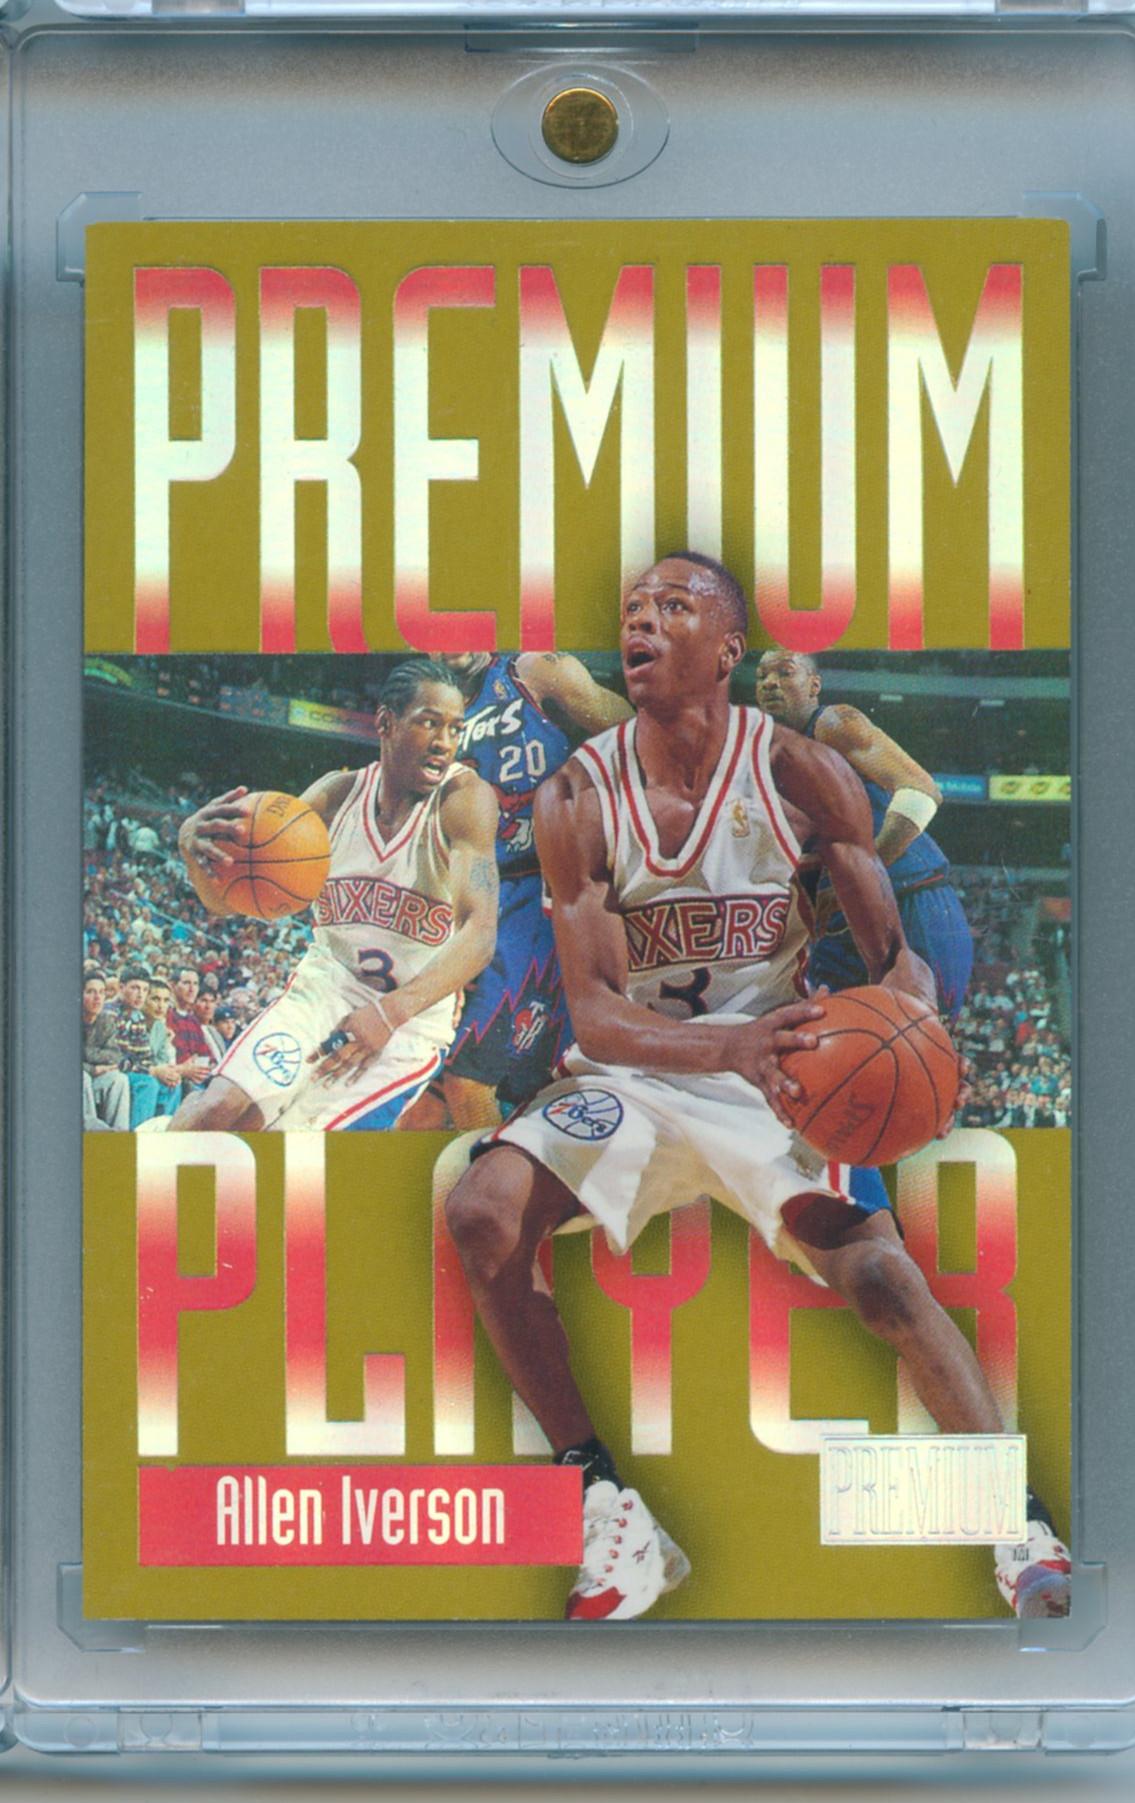 【PC 球星卡】1997-98 SKYBOX  阿伦 艾佛森 AI 得分王 MVP 折射 Prremium Player 老卡稀少 大比例 带全新卡砖!